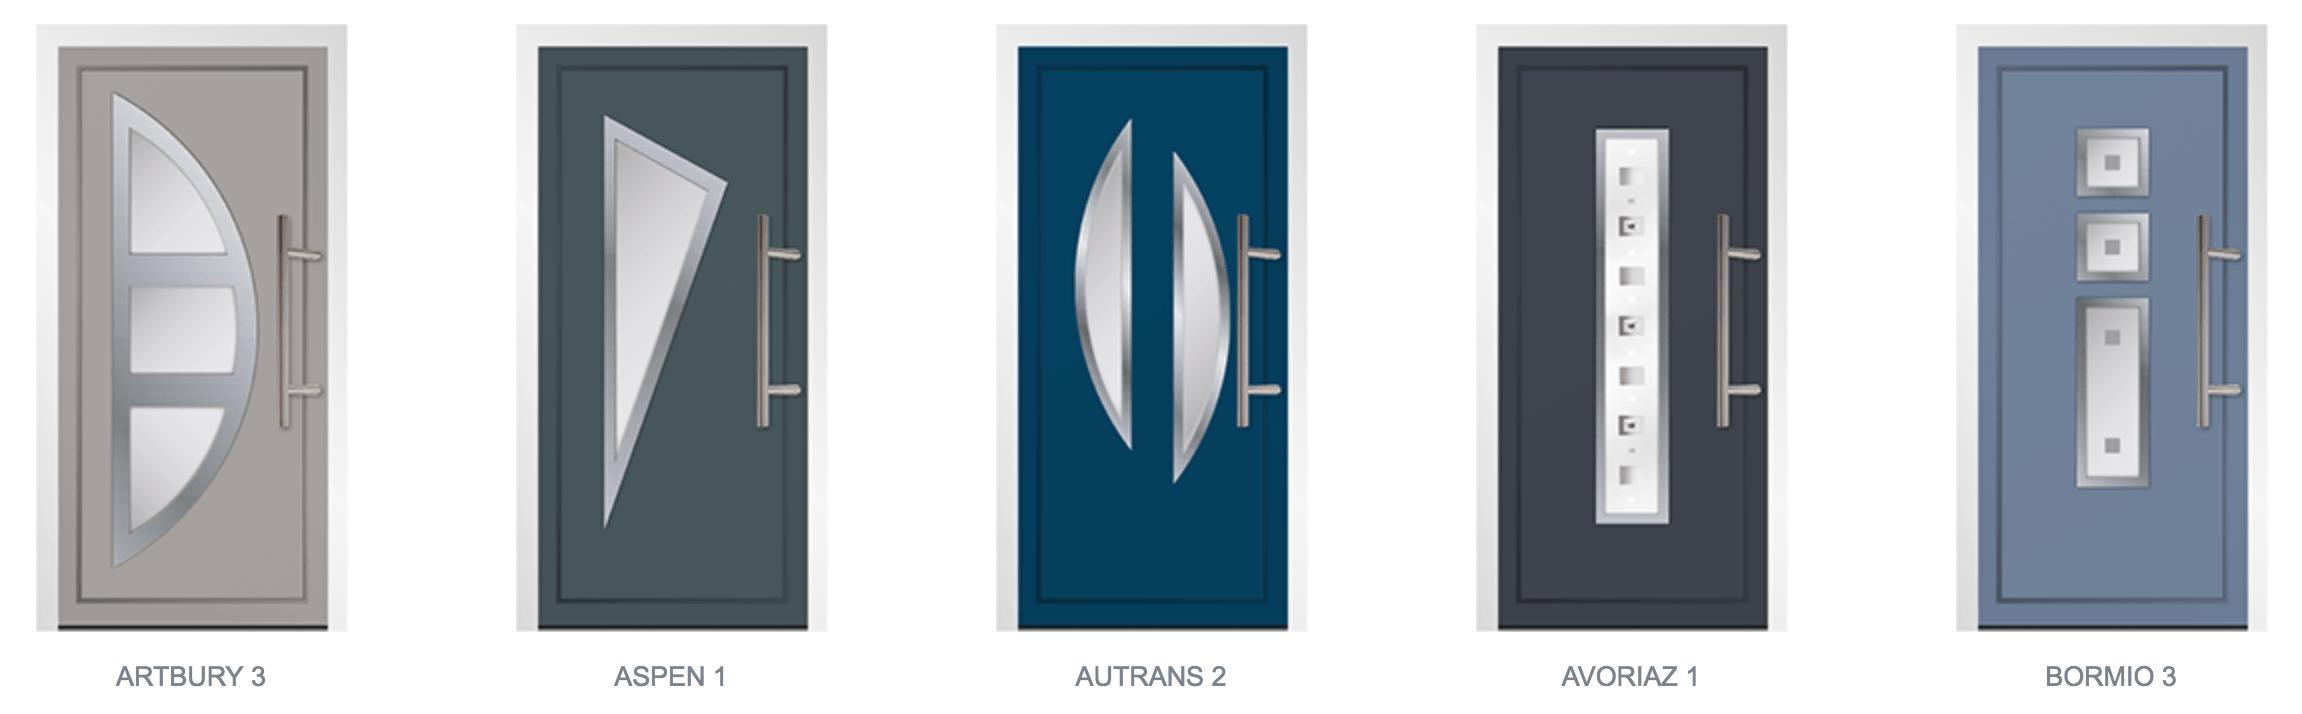 Aluminium Door Styles02